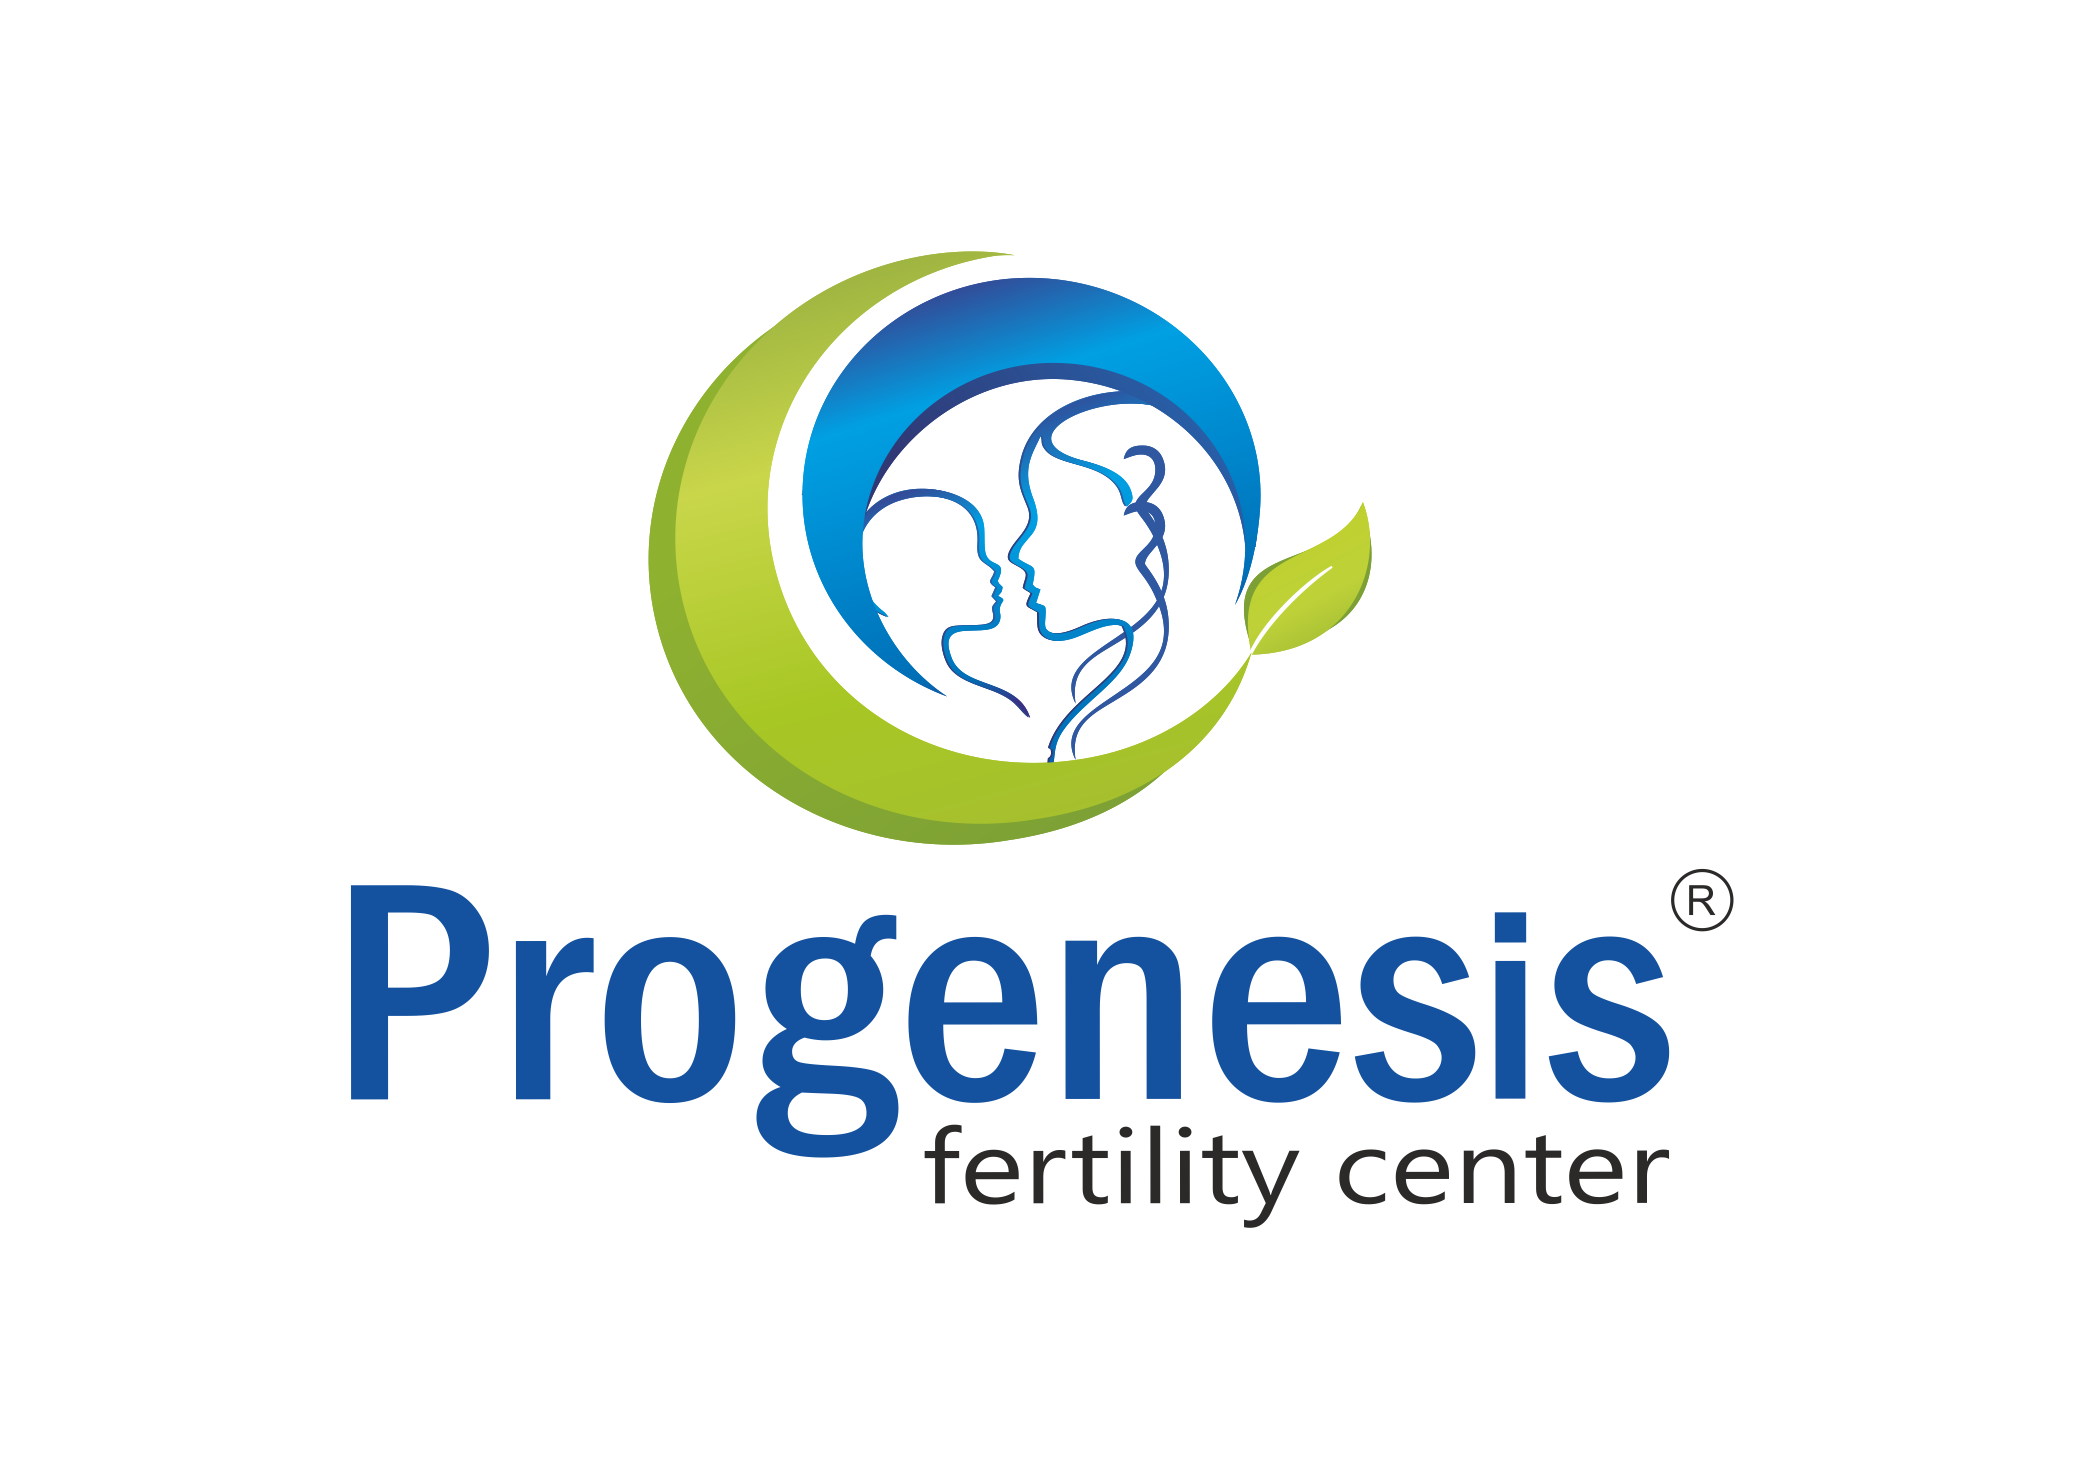 Progenesis Fertility Center